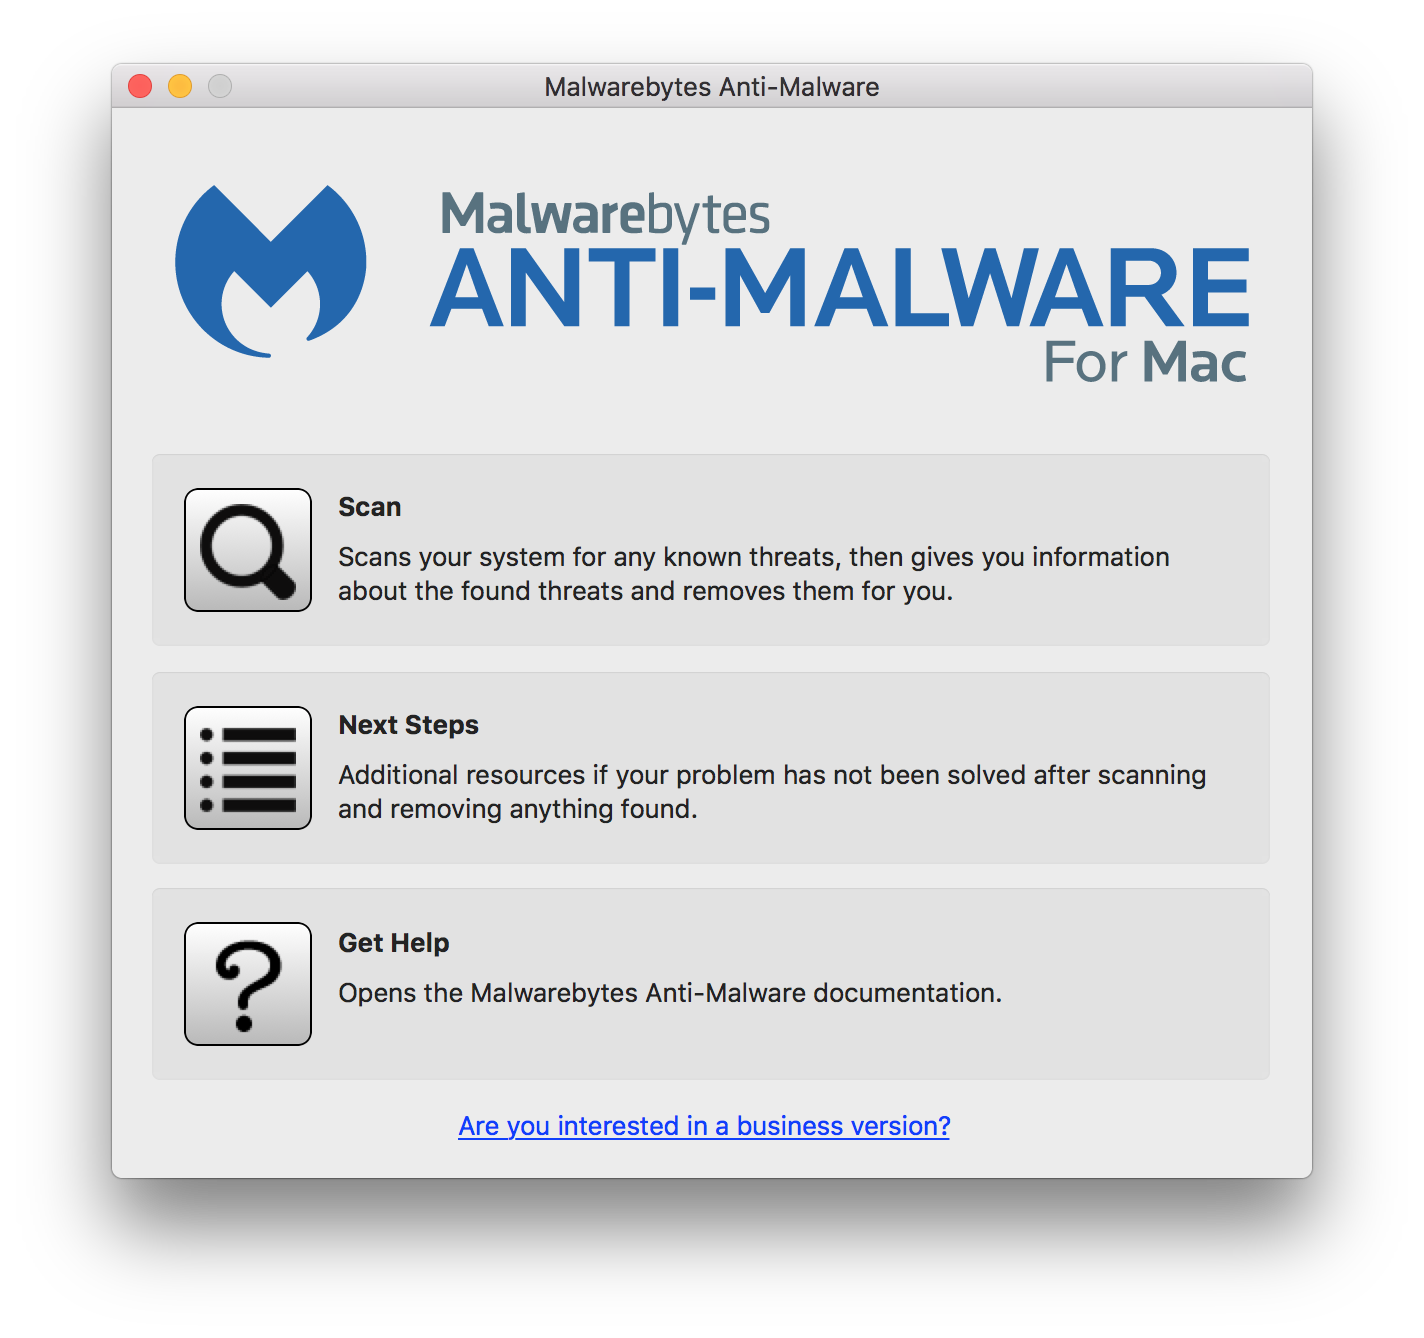 malwarebytes anti malware for mac